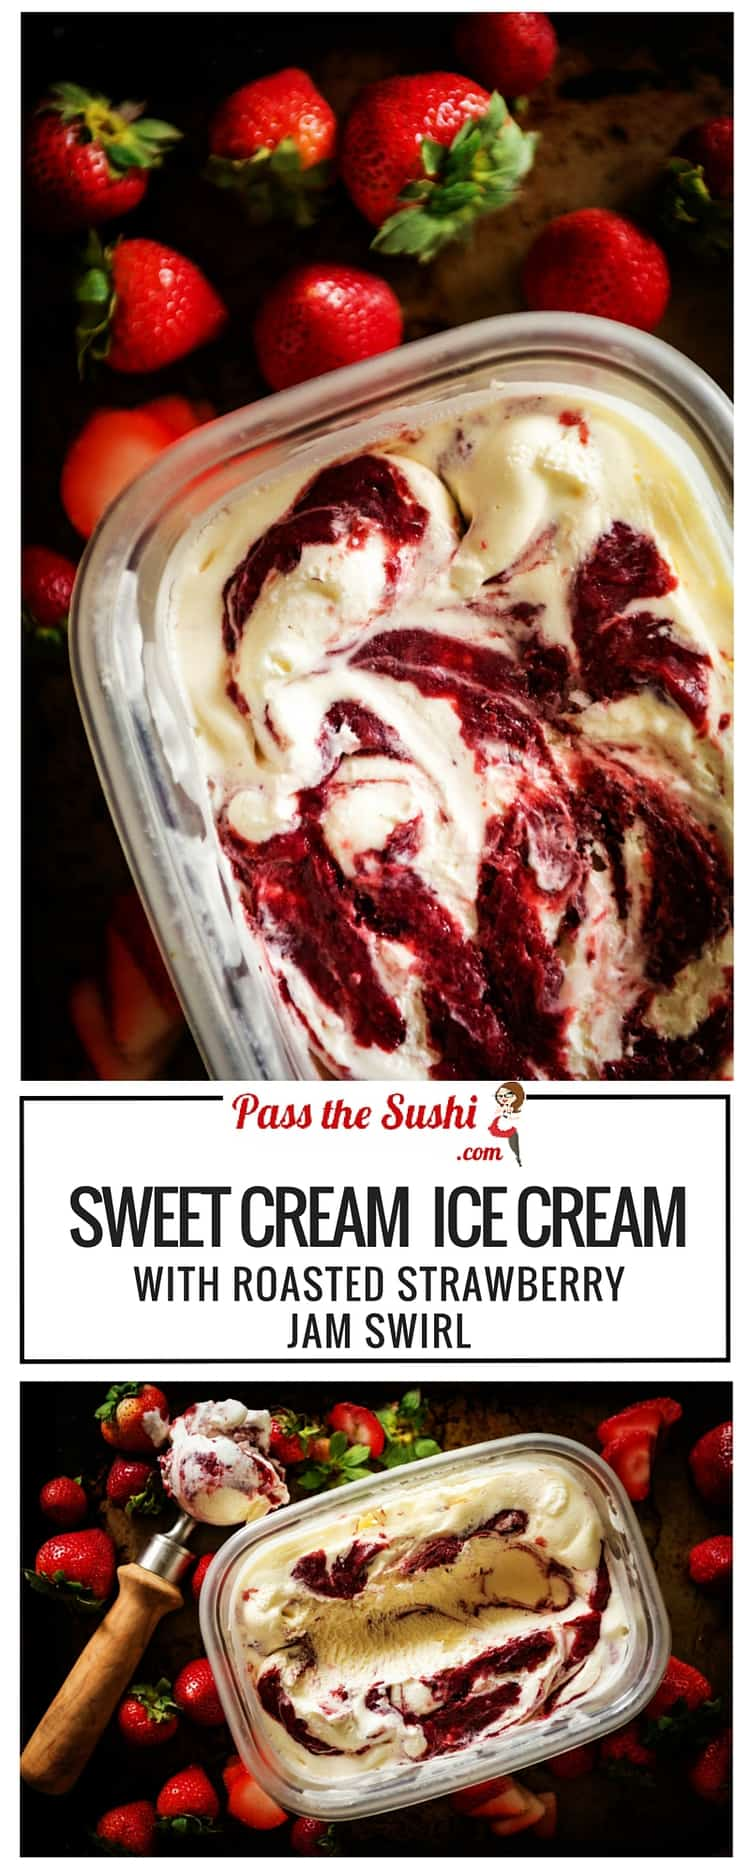 Sweet Cream Ice Cream with Roasted Strawberry Jam Swirl